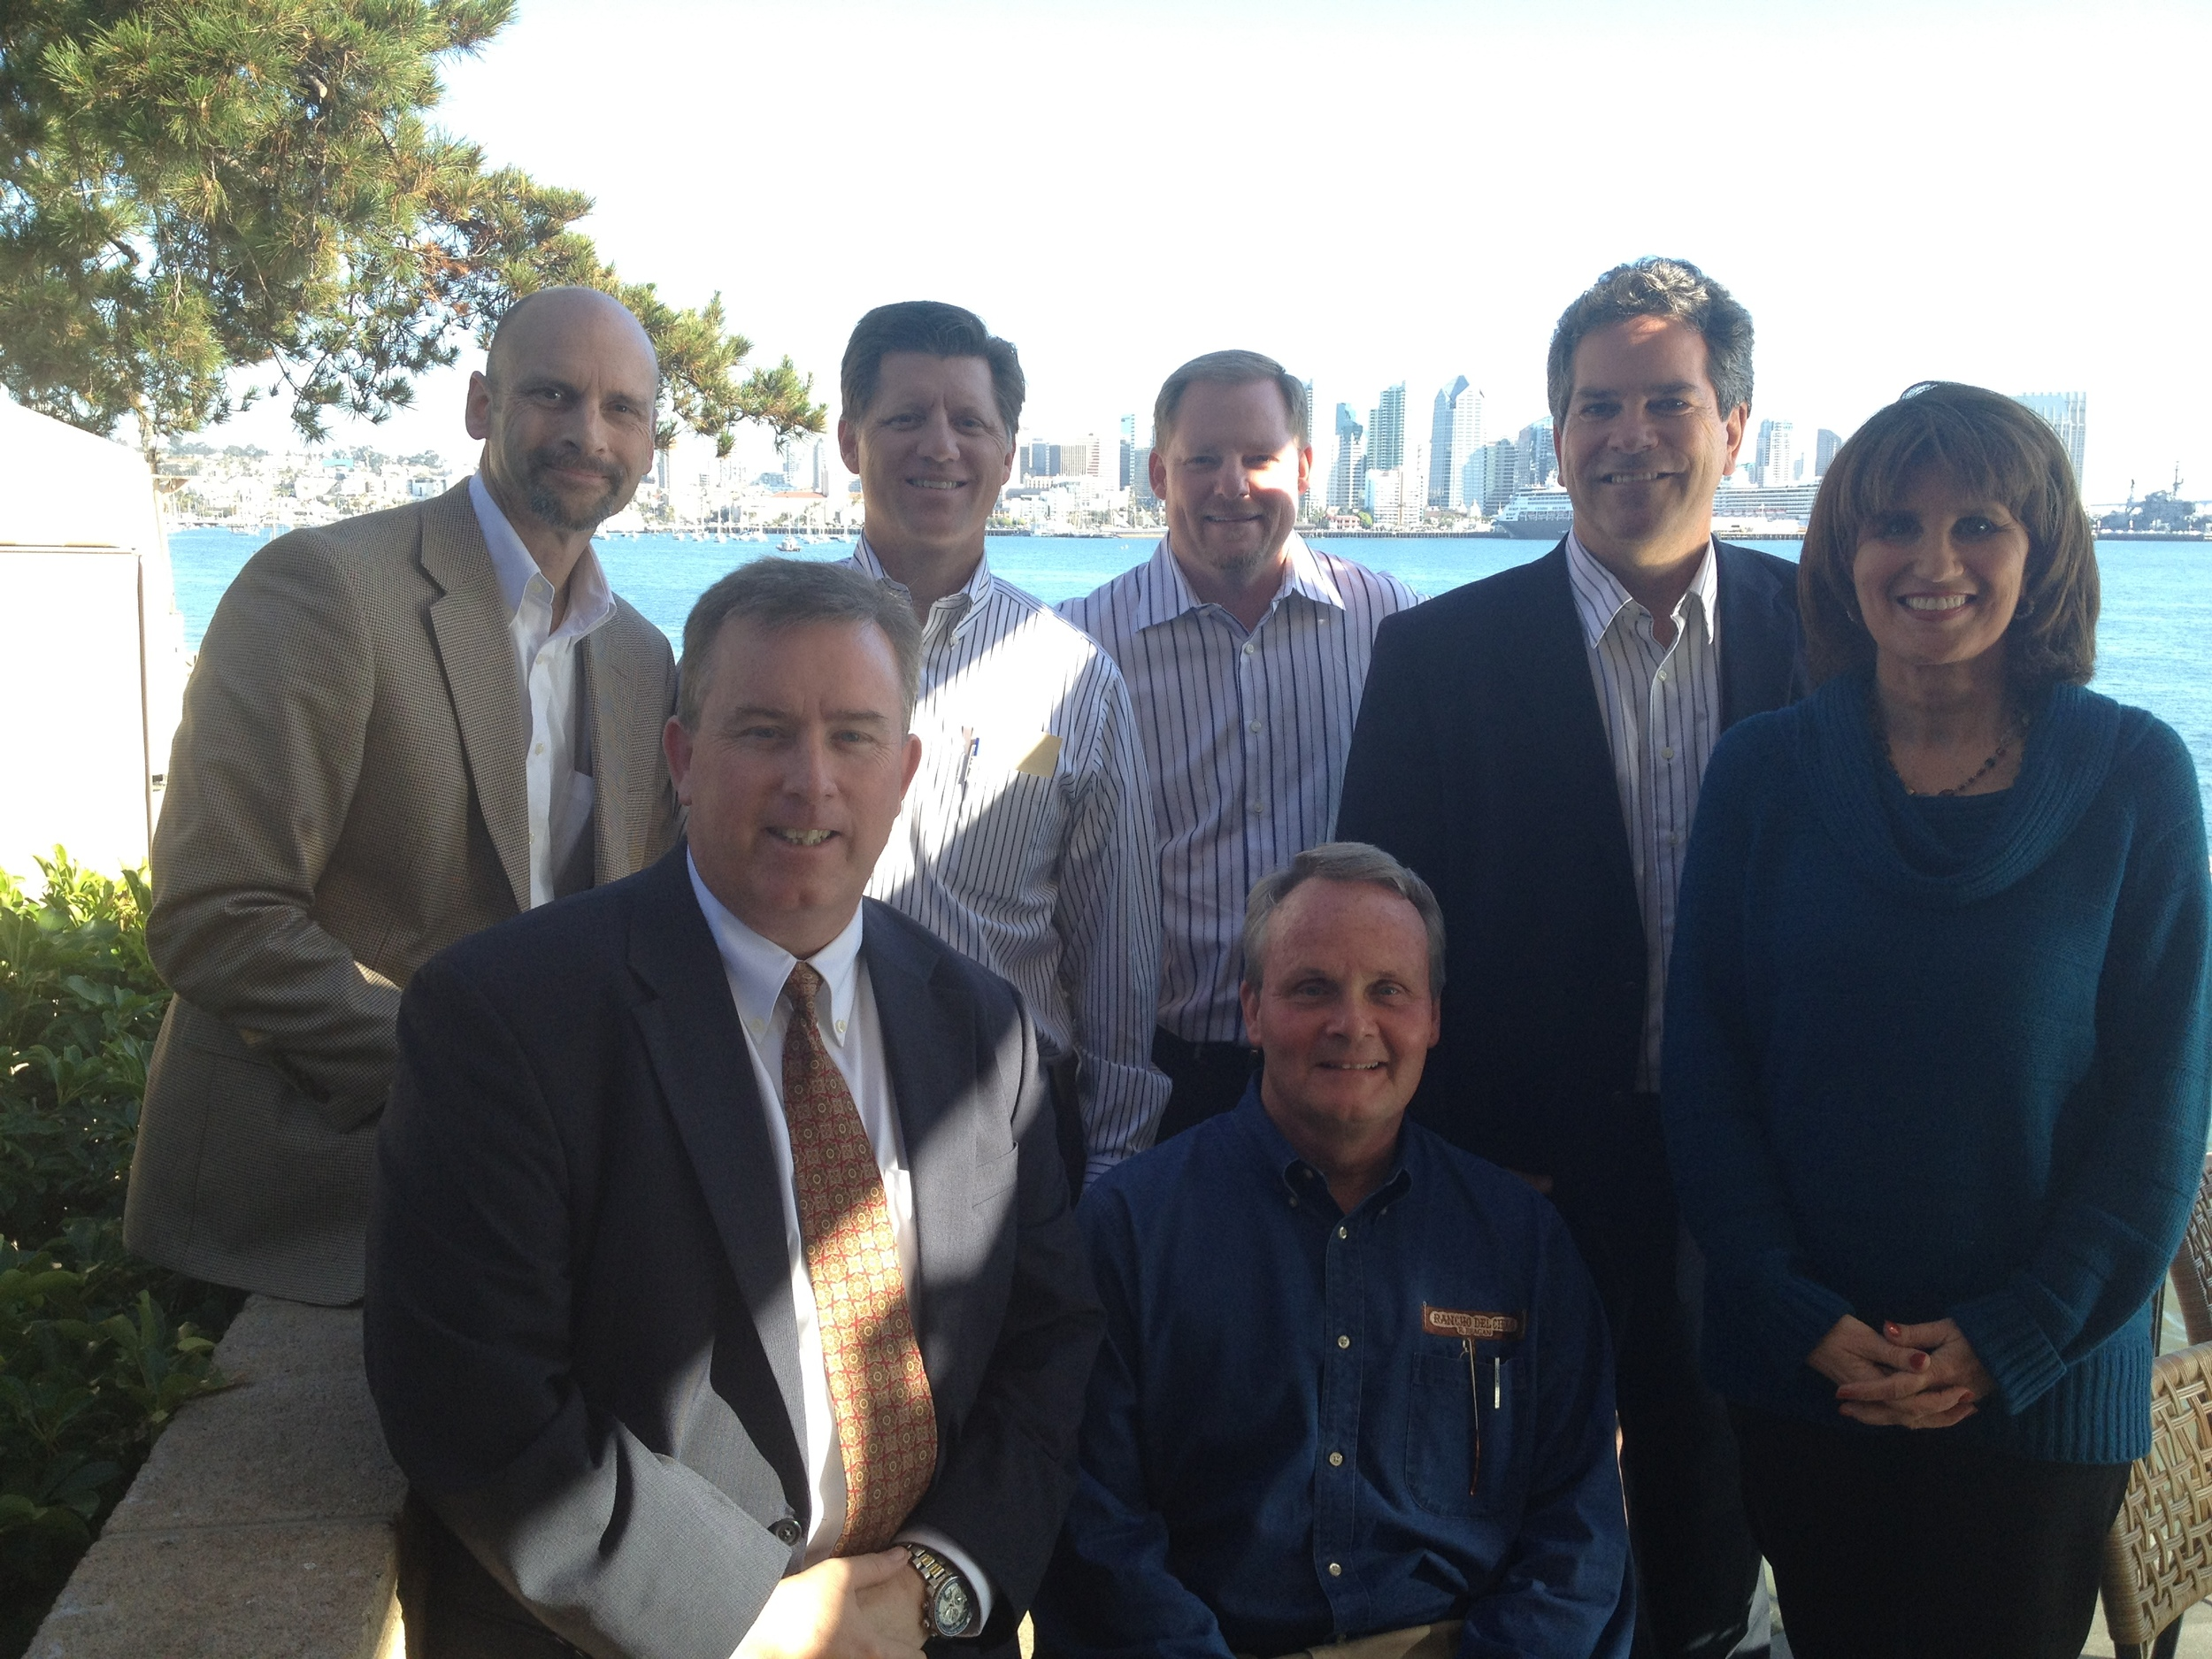 Lawrence Reed, Gary Cass, Eric Anderson, Brian Joness 2.JPG